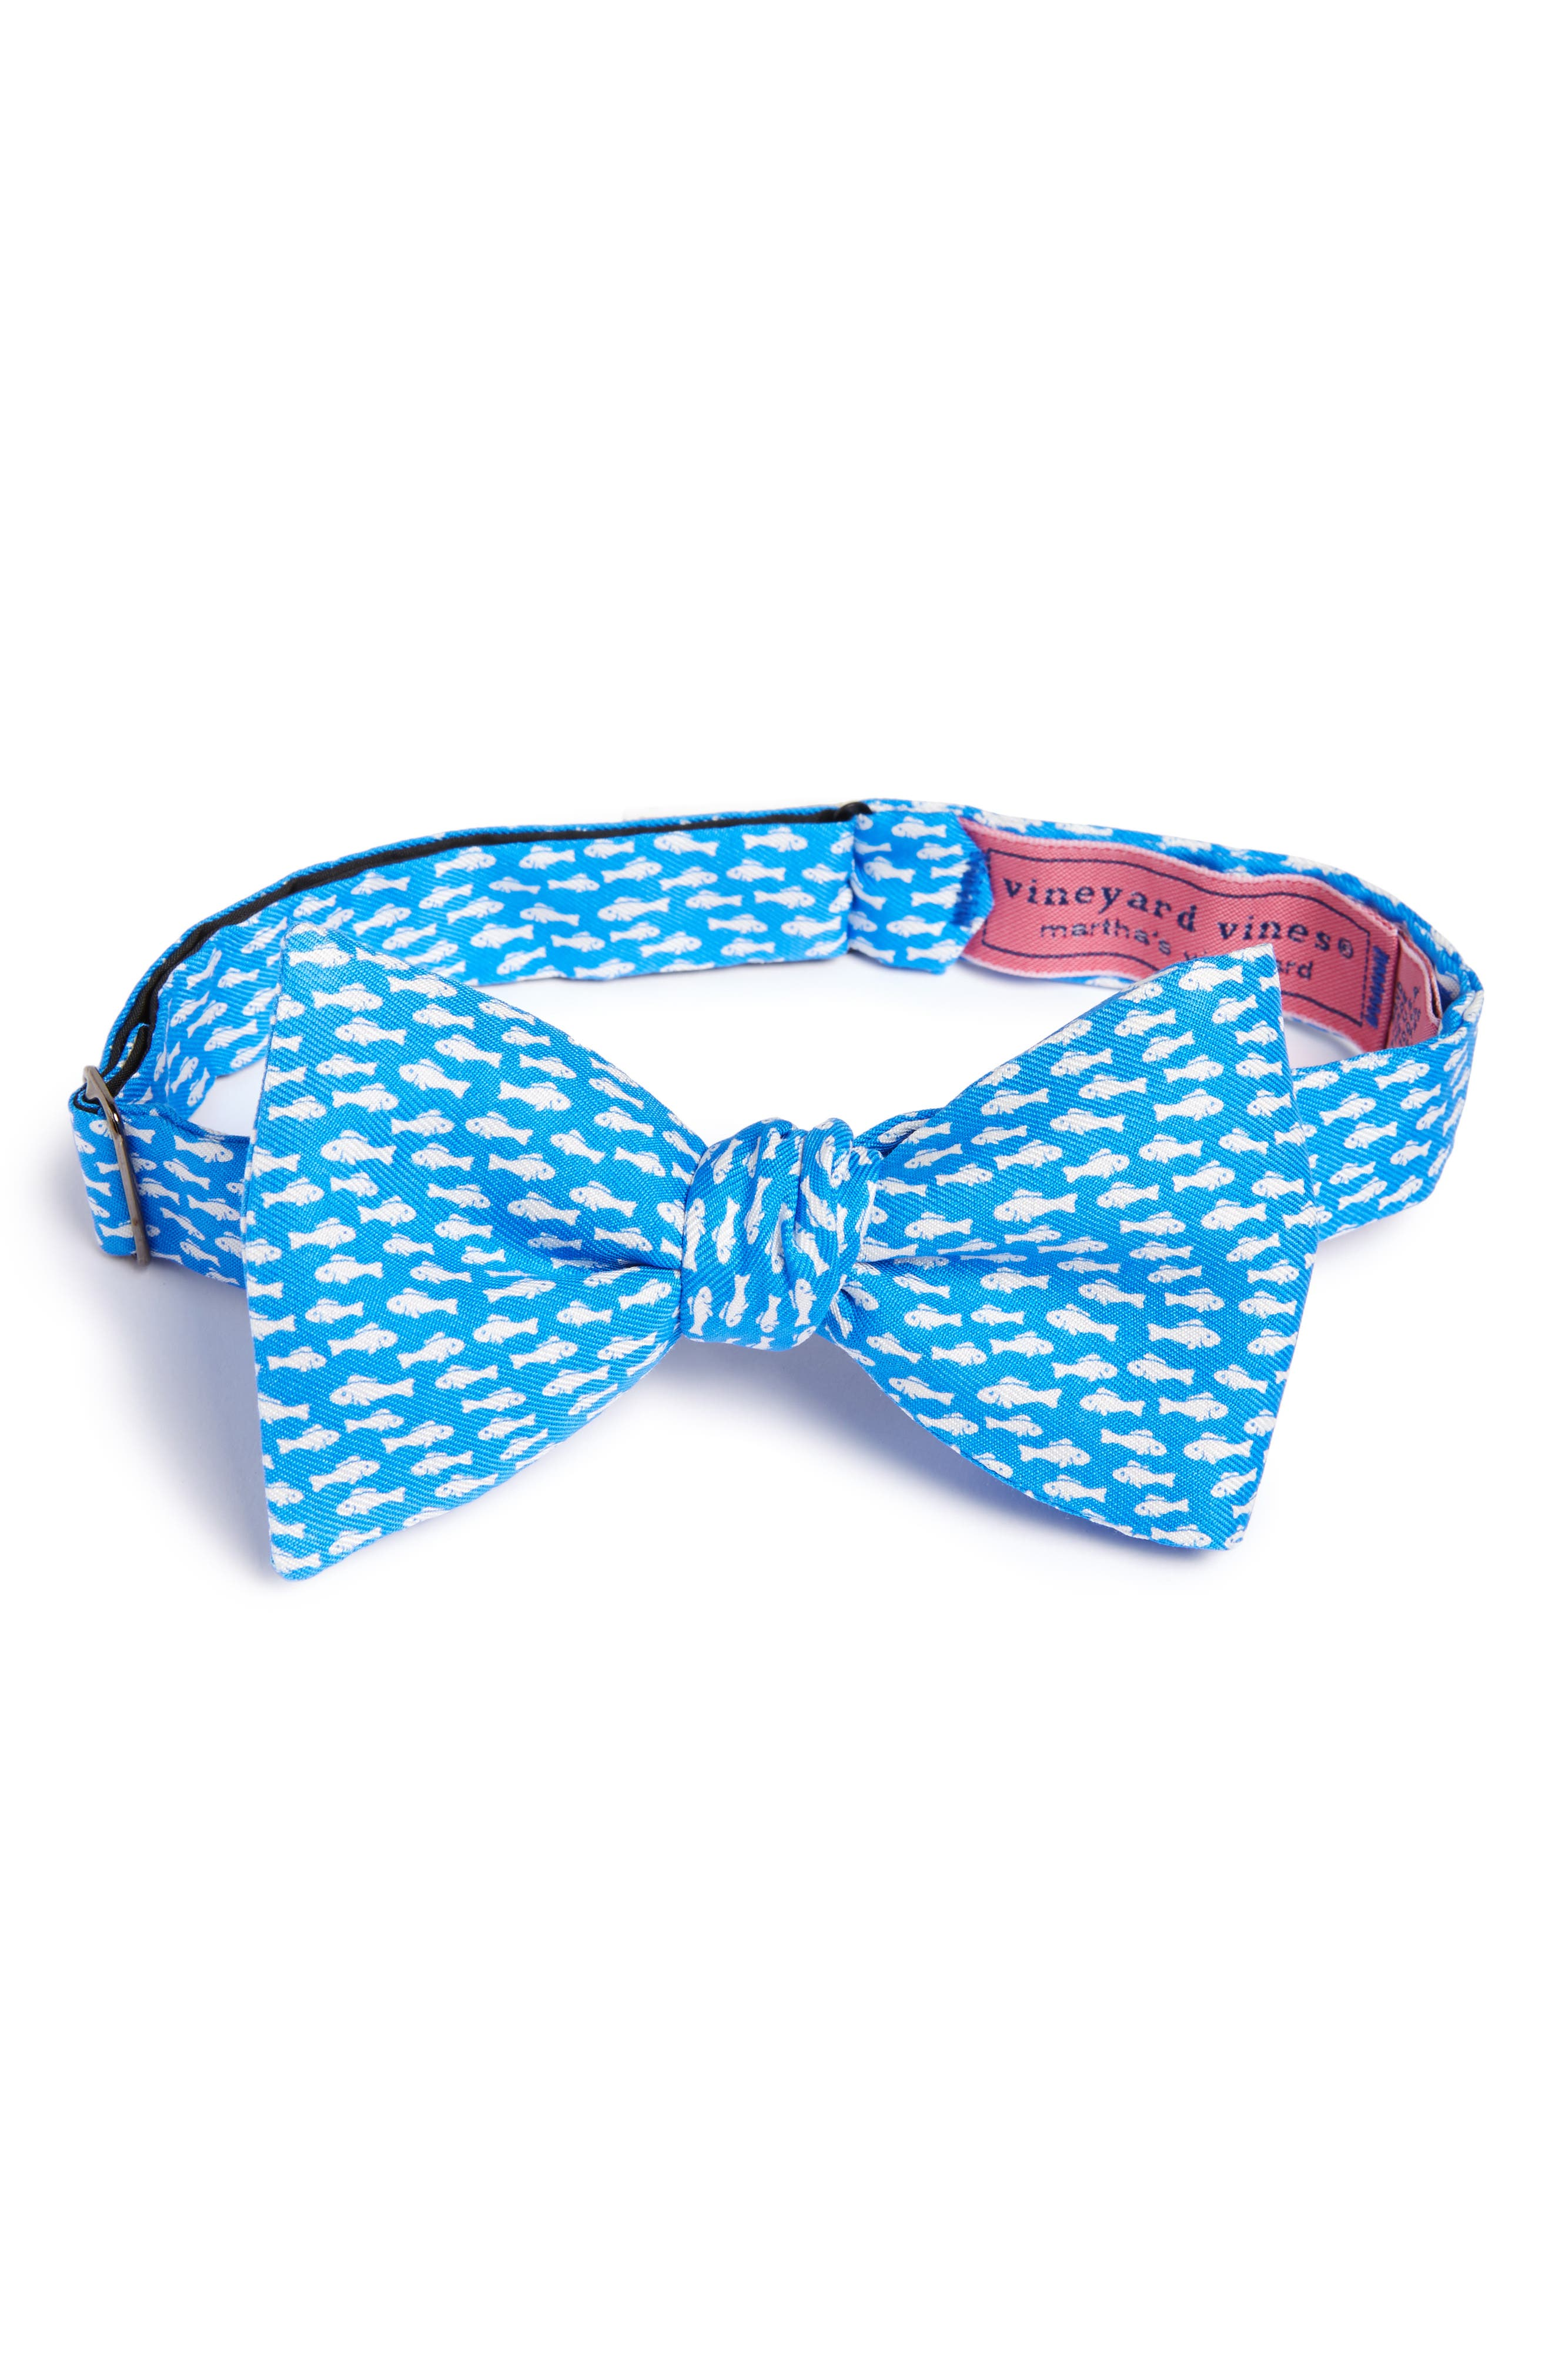 Go Fish Silk Bow Tie,                             Main thumbnail 1, color,                             420